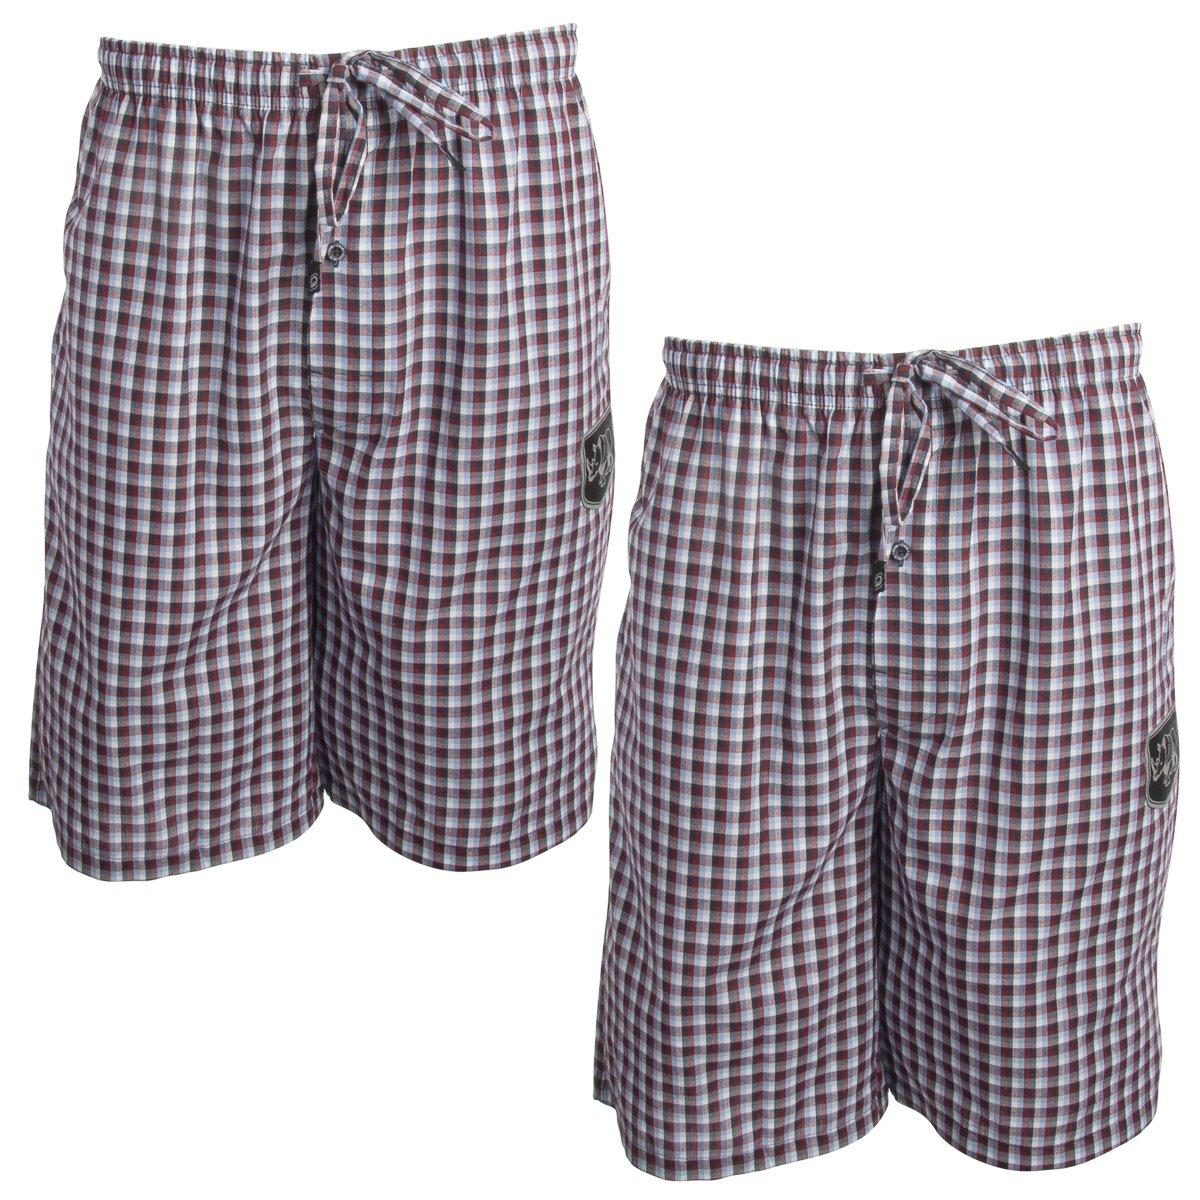 Ecko Unltd. (2 Pack Cool Cotton Pajama Shorts for Men Sleep Shorts Loungewear Sleepwear Home Travel